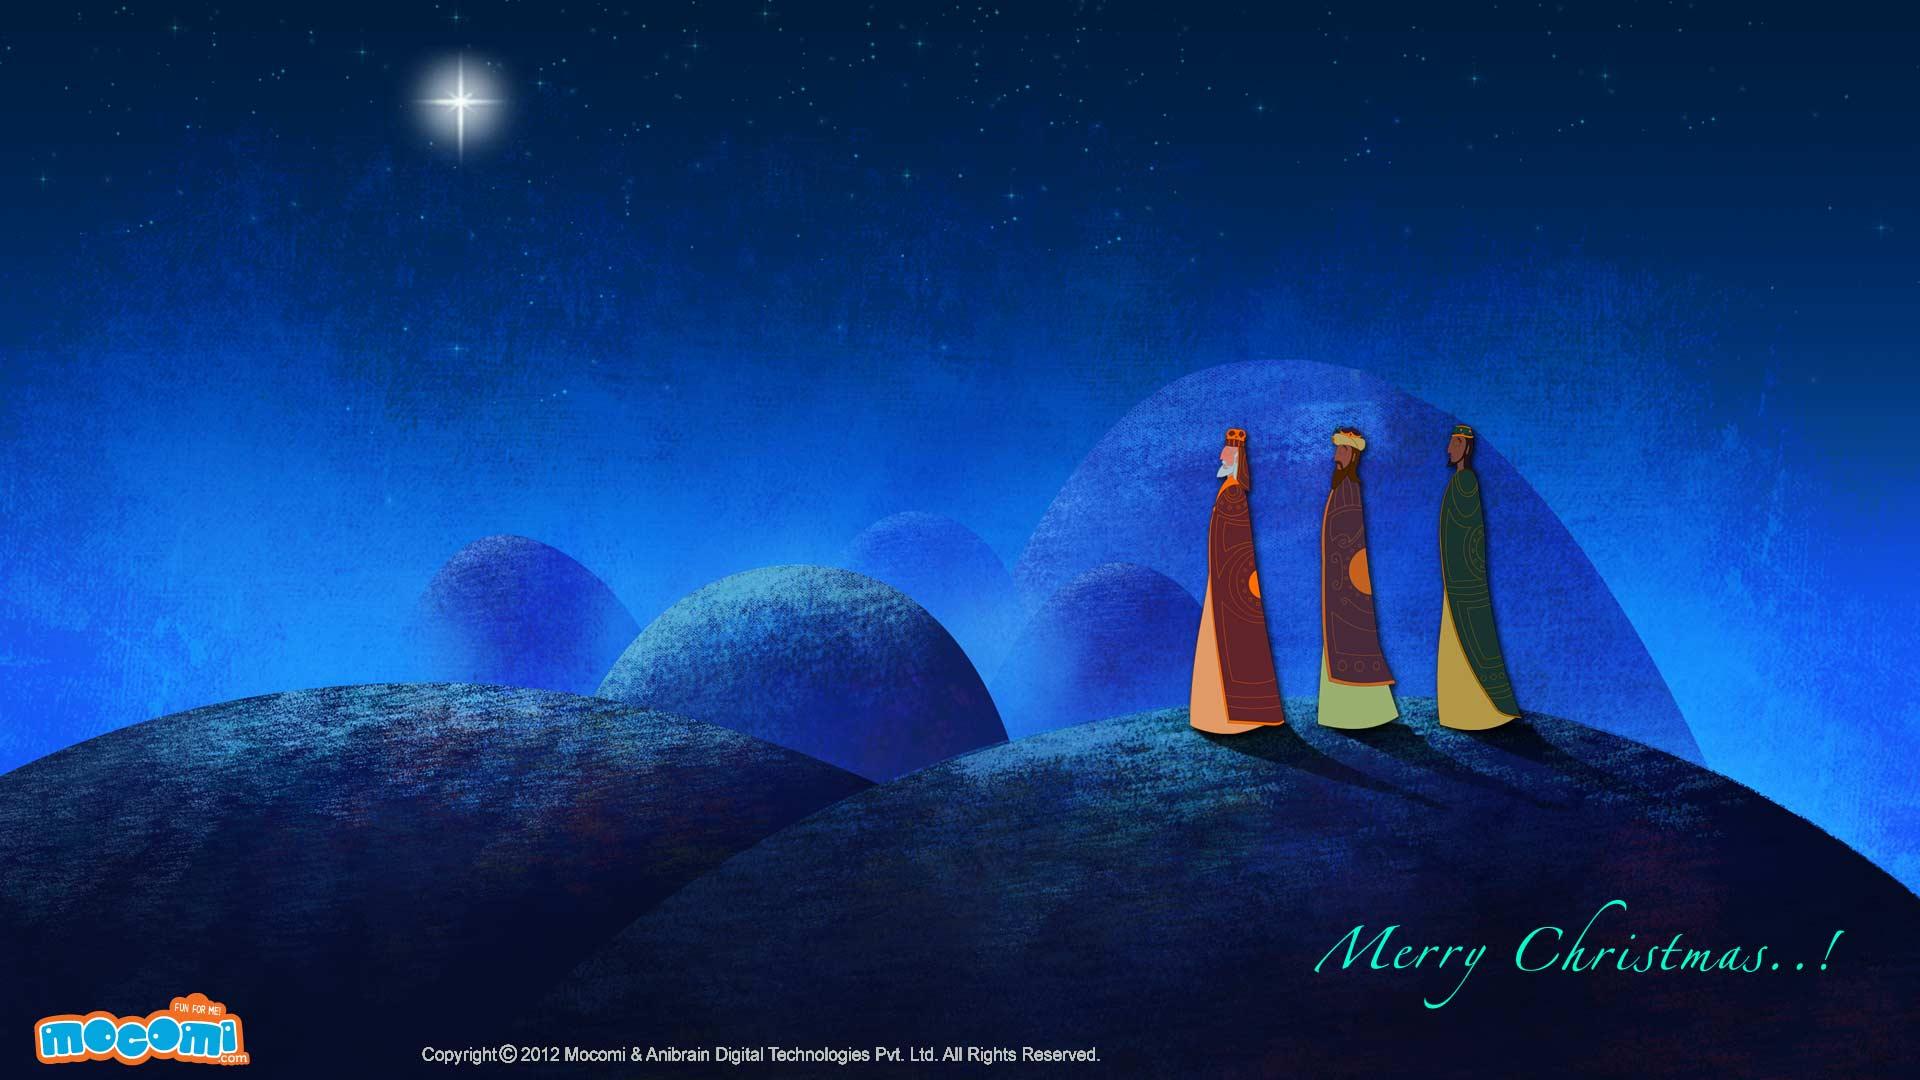 Merry Christmas – Three Wisemen to Bethlehem